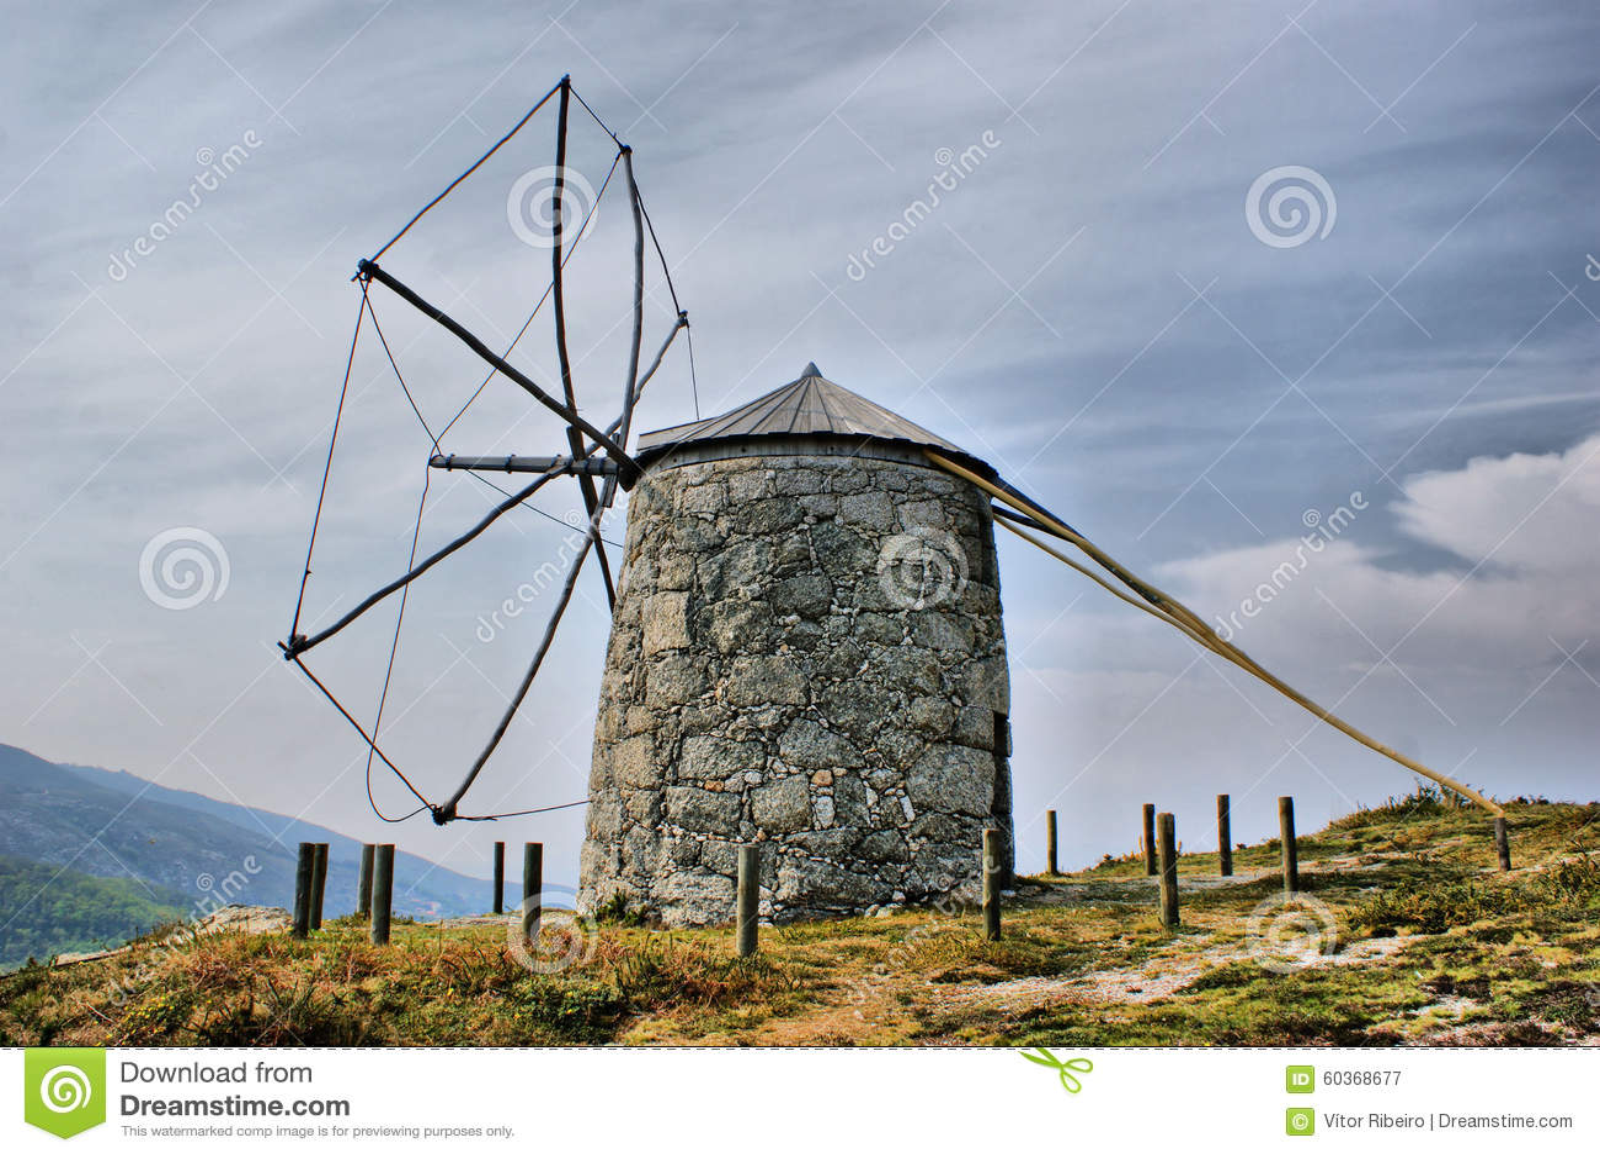 Old windmill of Aboim